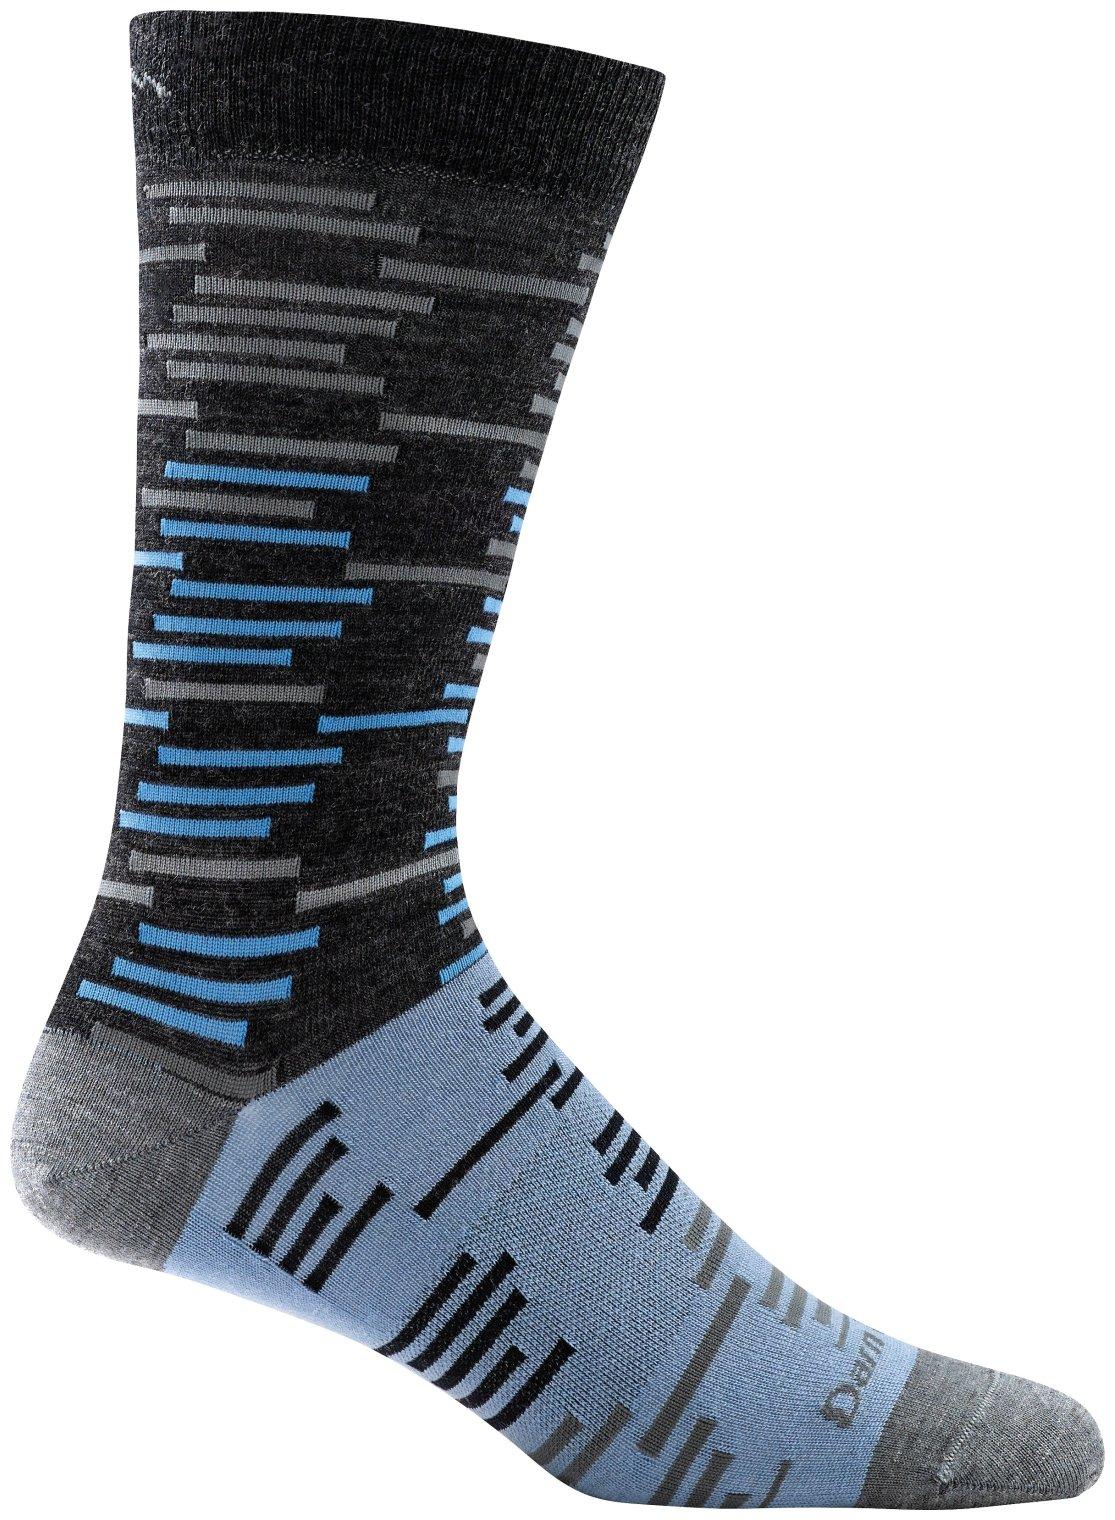 Darn Tough Dashes Crew Light Sock - Men's Charcoal Large